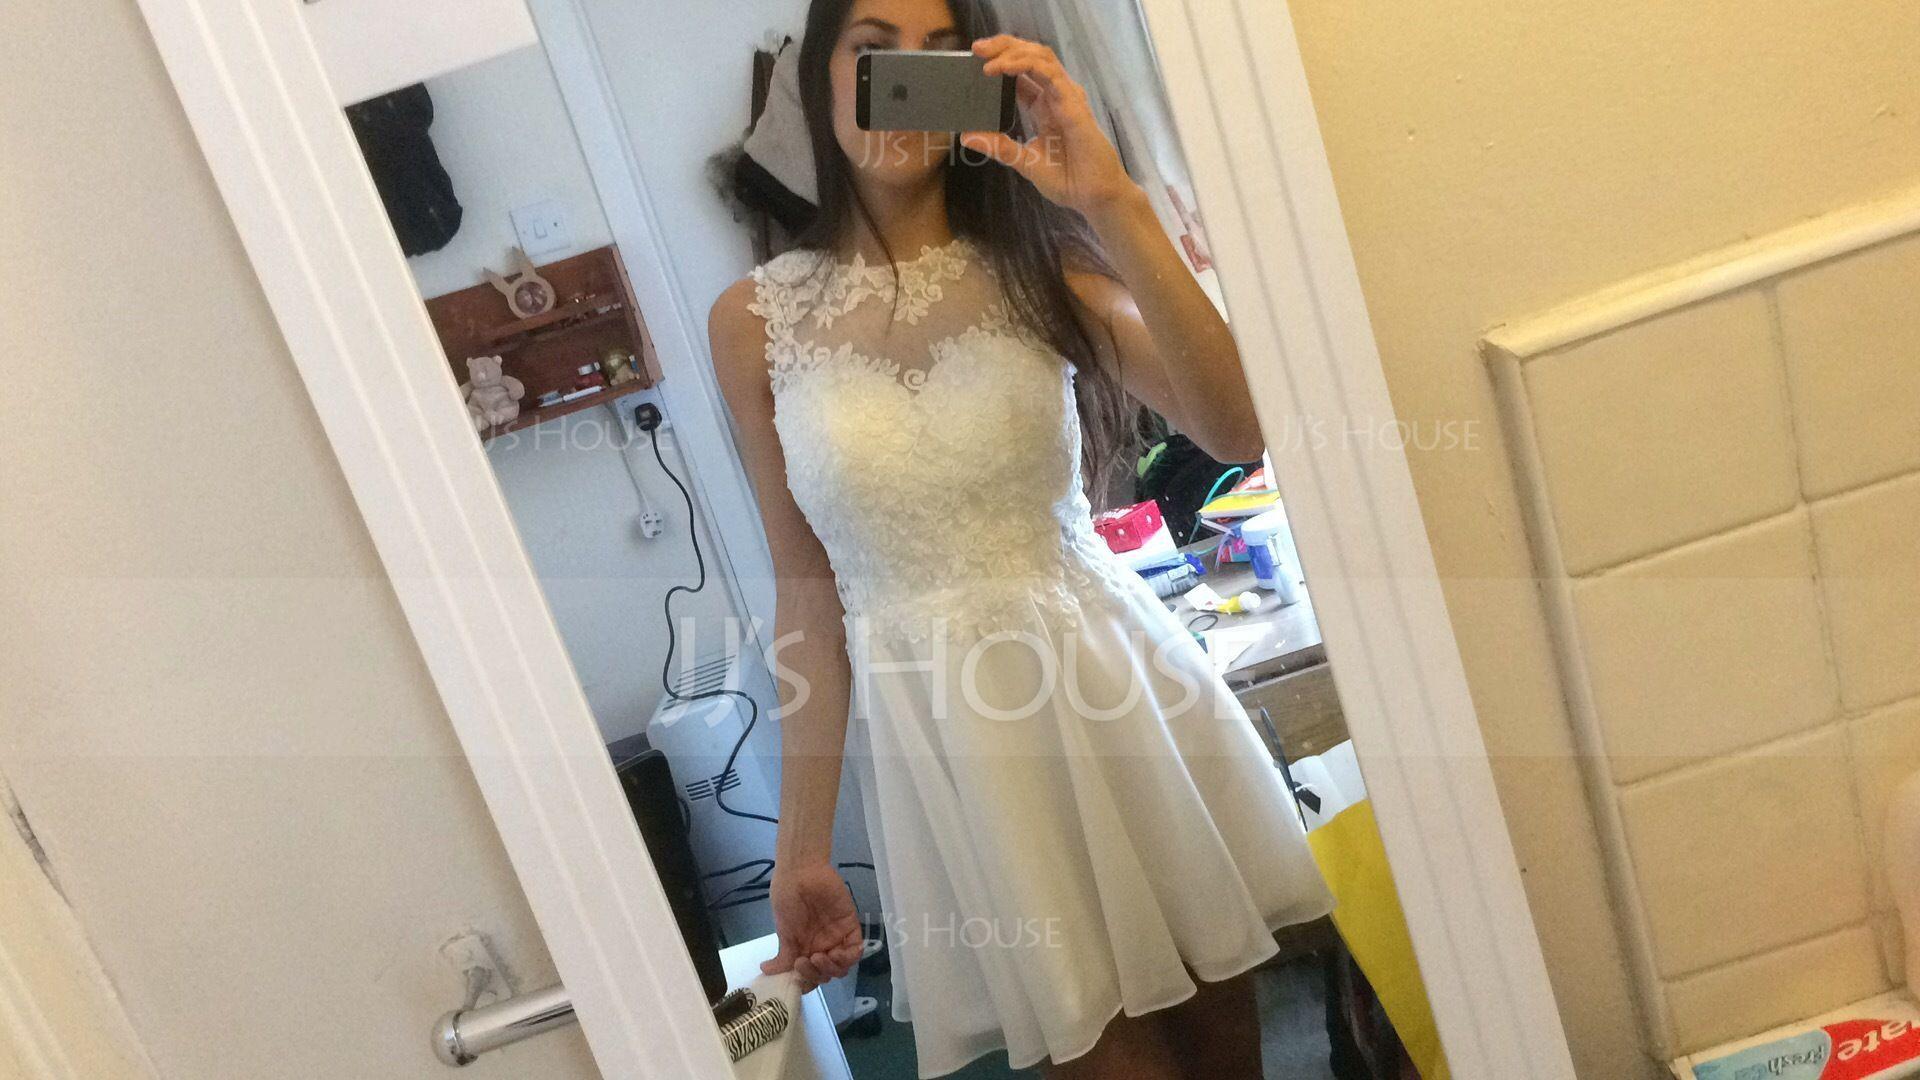 A-Line/Princess Scoop Neck Short/Mini Chiffon Cocktail Dress (016091226)